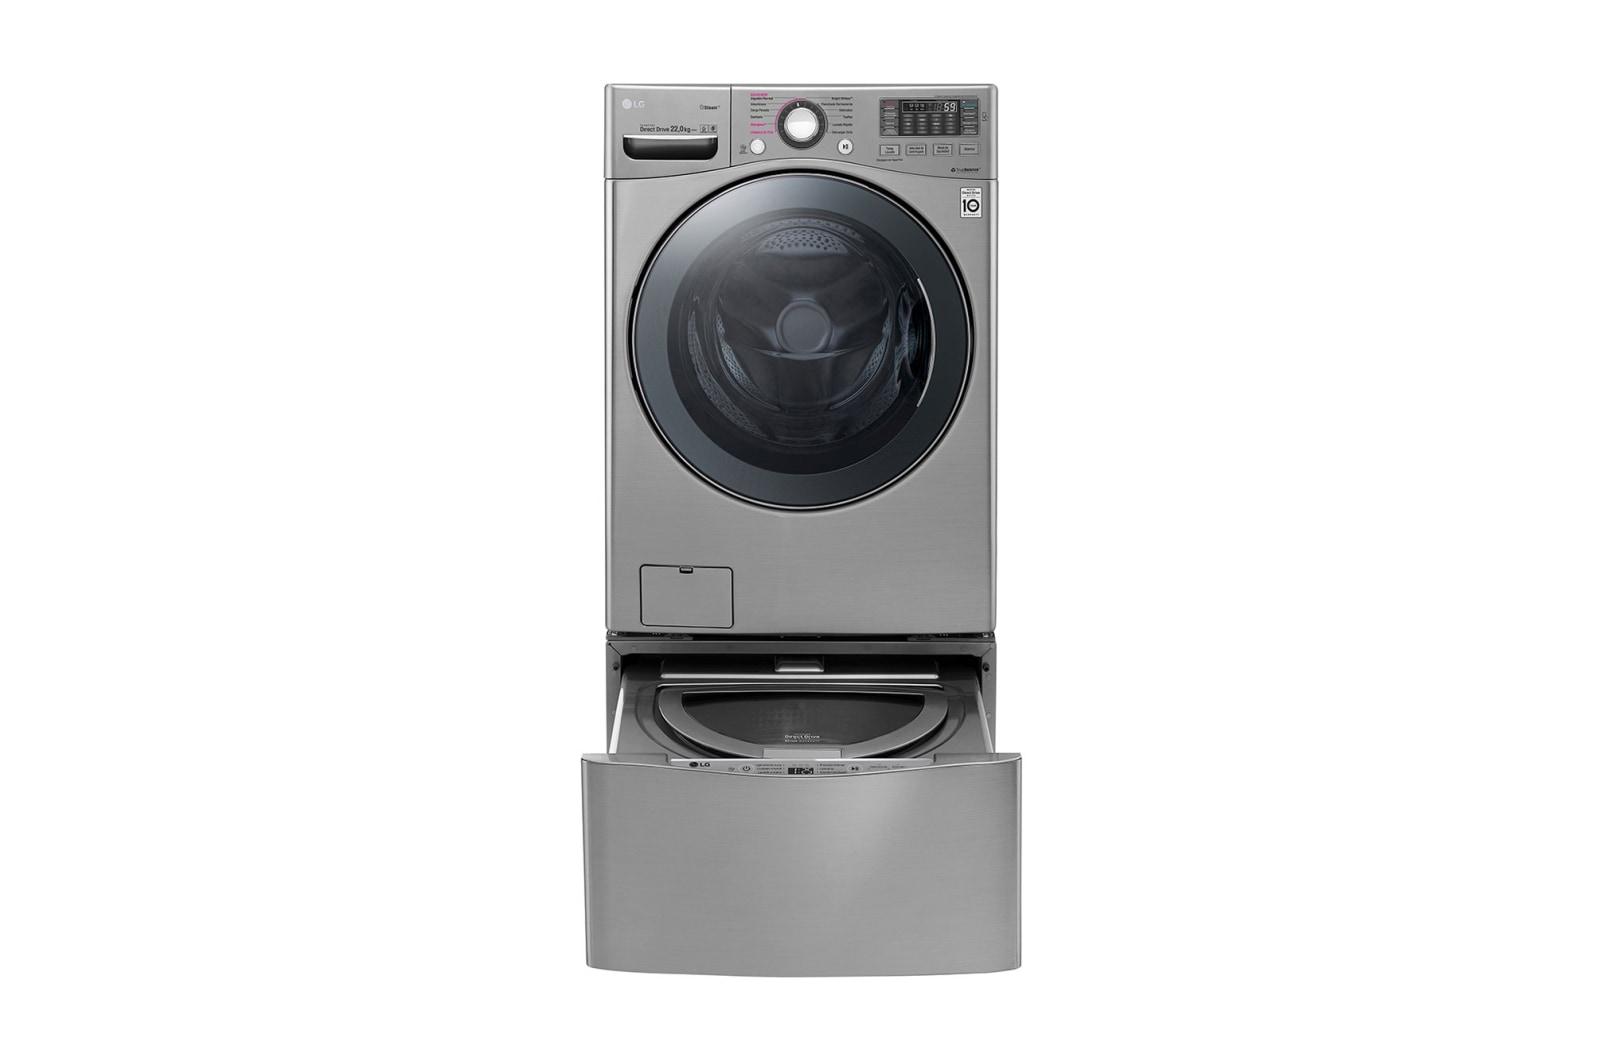 Lavadora Carga Frontal de 55 Libras - 6 Motion DD con Motor Inverter Direct Drive - Smart Diagnosis? - Compatible con LG TWINWash? Mini